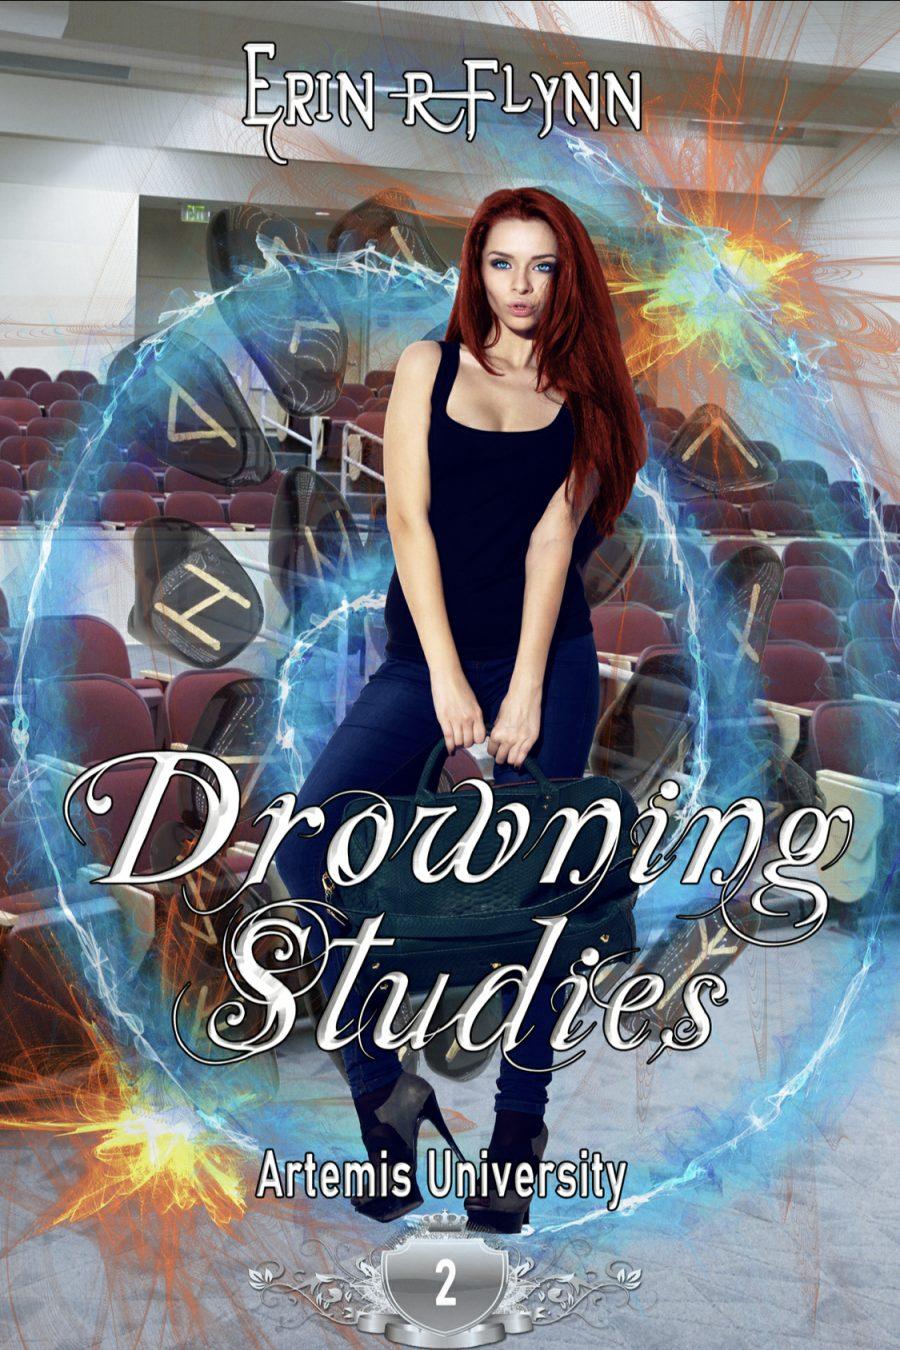 Drowning Studies (Artemis University - Book 2) by Erin R. Flynn - A Book Review #BookReview #Academy #SlowBuild #MediumBurn #RH #4Stars #KindleUnlimited #KU